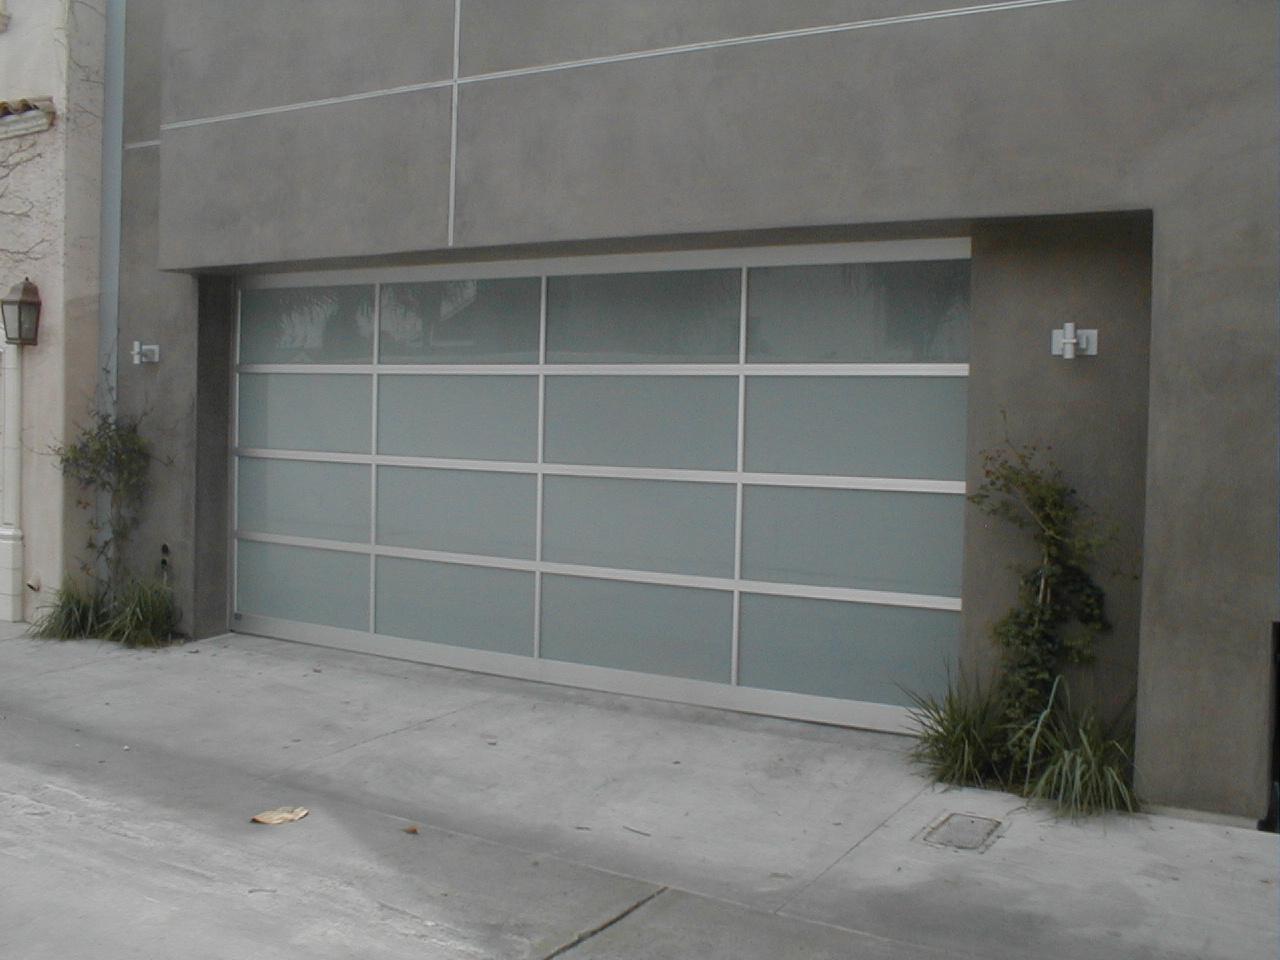 Fullsize Of Contemporary Garage Doors